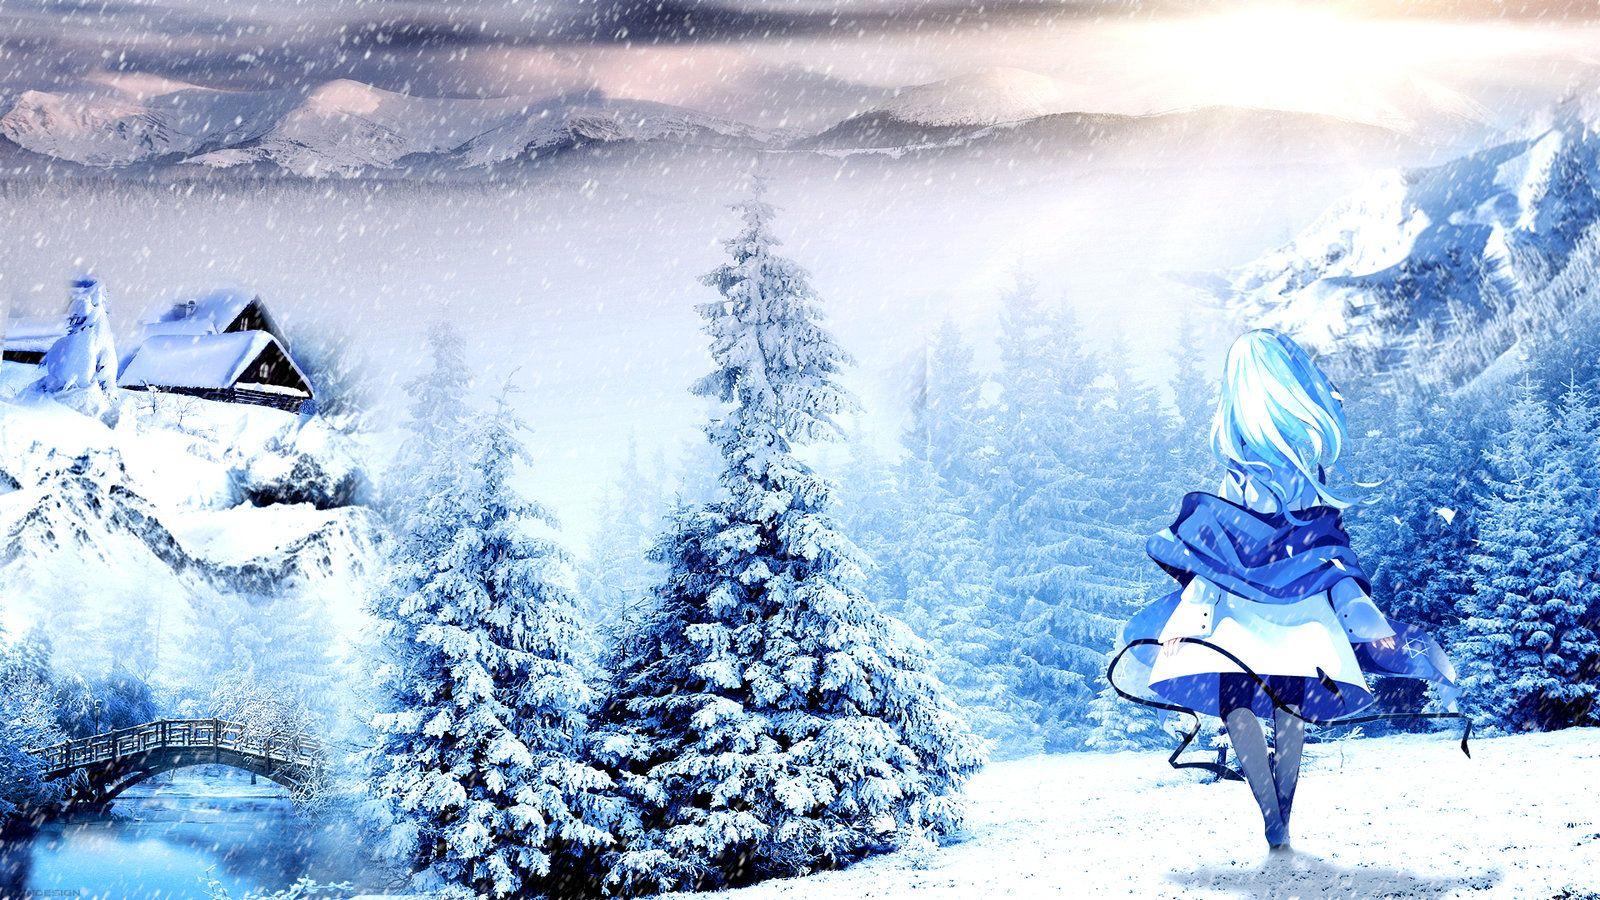 Anime Winter Wallpaper By Atndesign Winter Wallpaper Anime Wallpaper